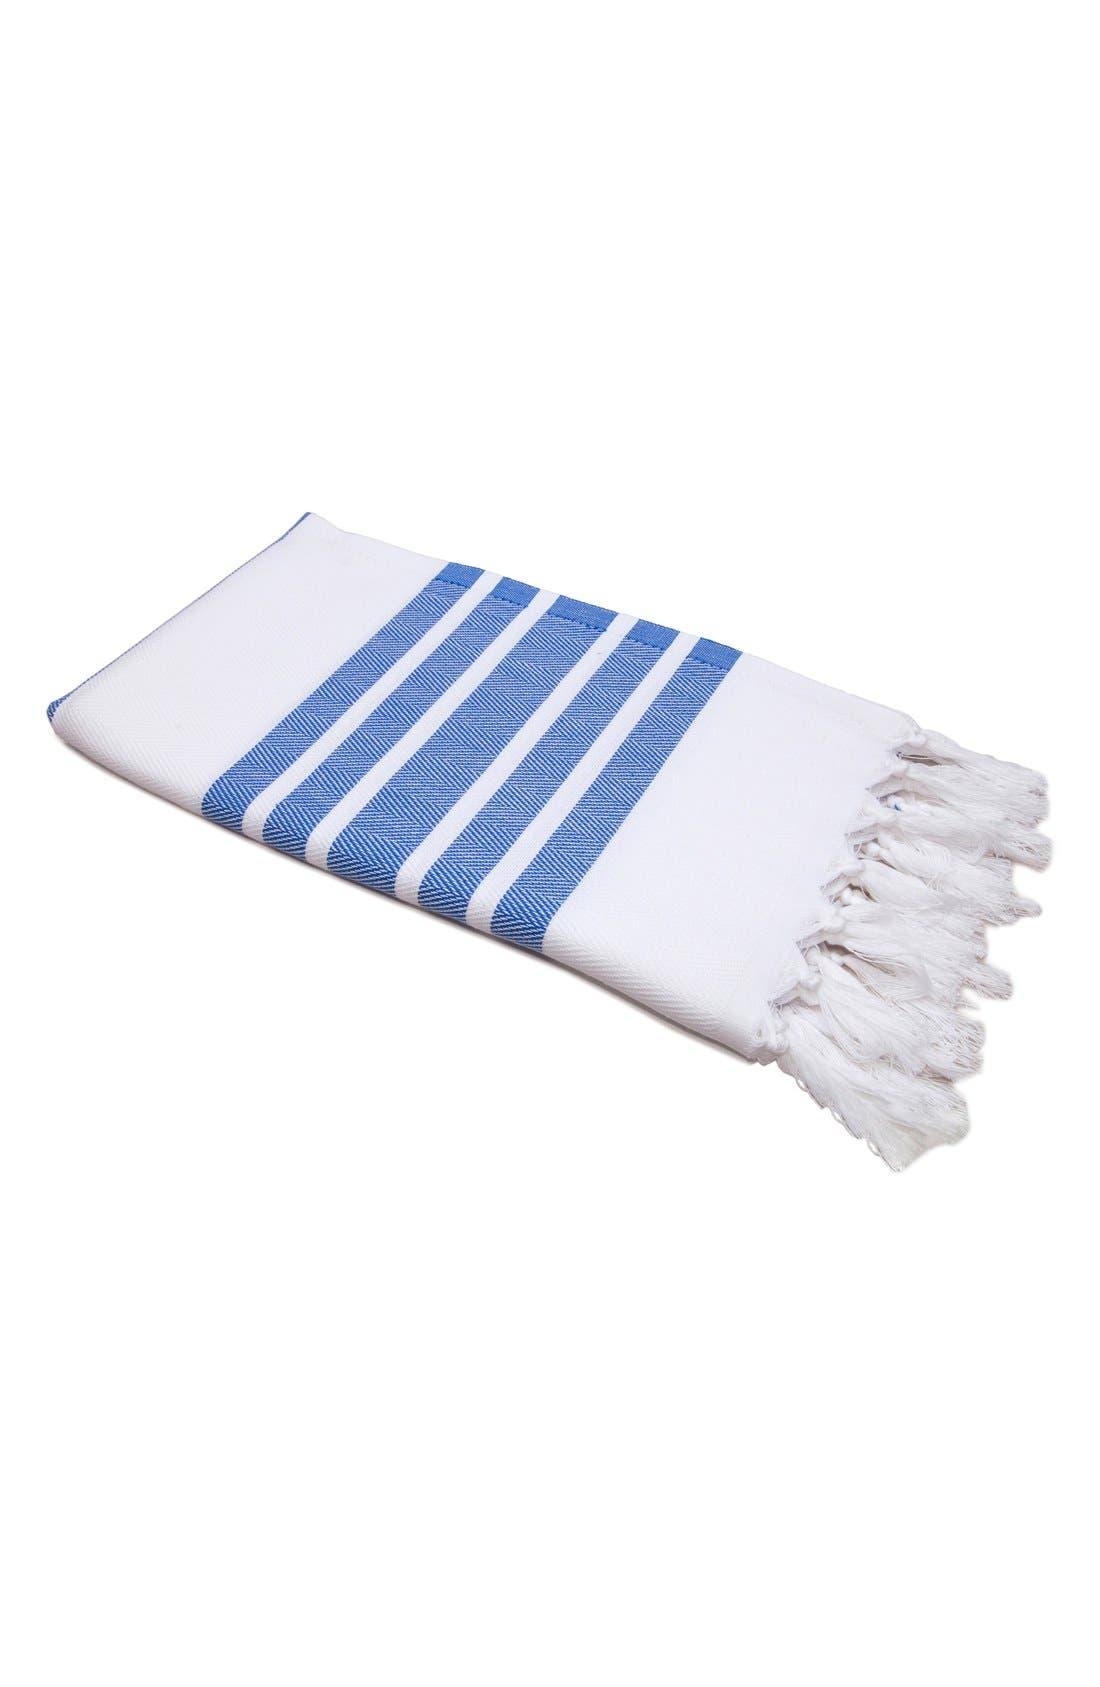 Herringbone Striped Turkish Pestemal Towel,                             Main thumbnail 1, color,                             Royal Blue/ White